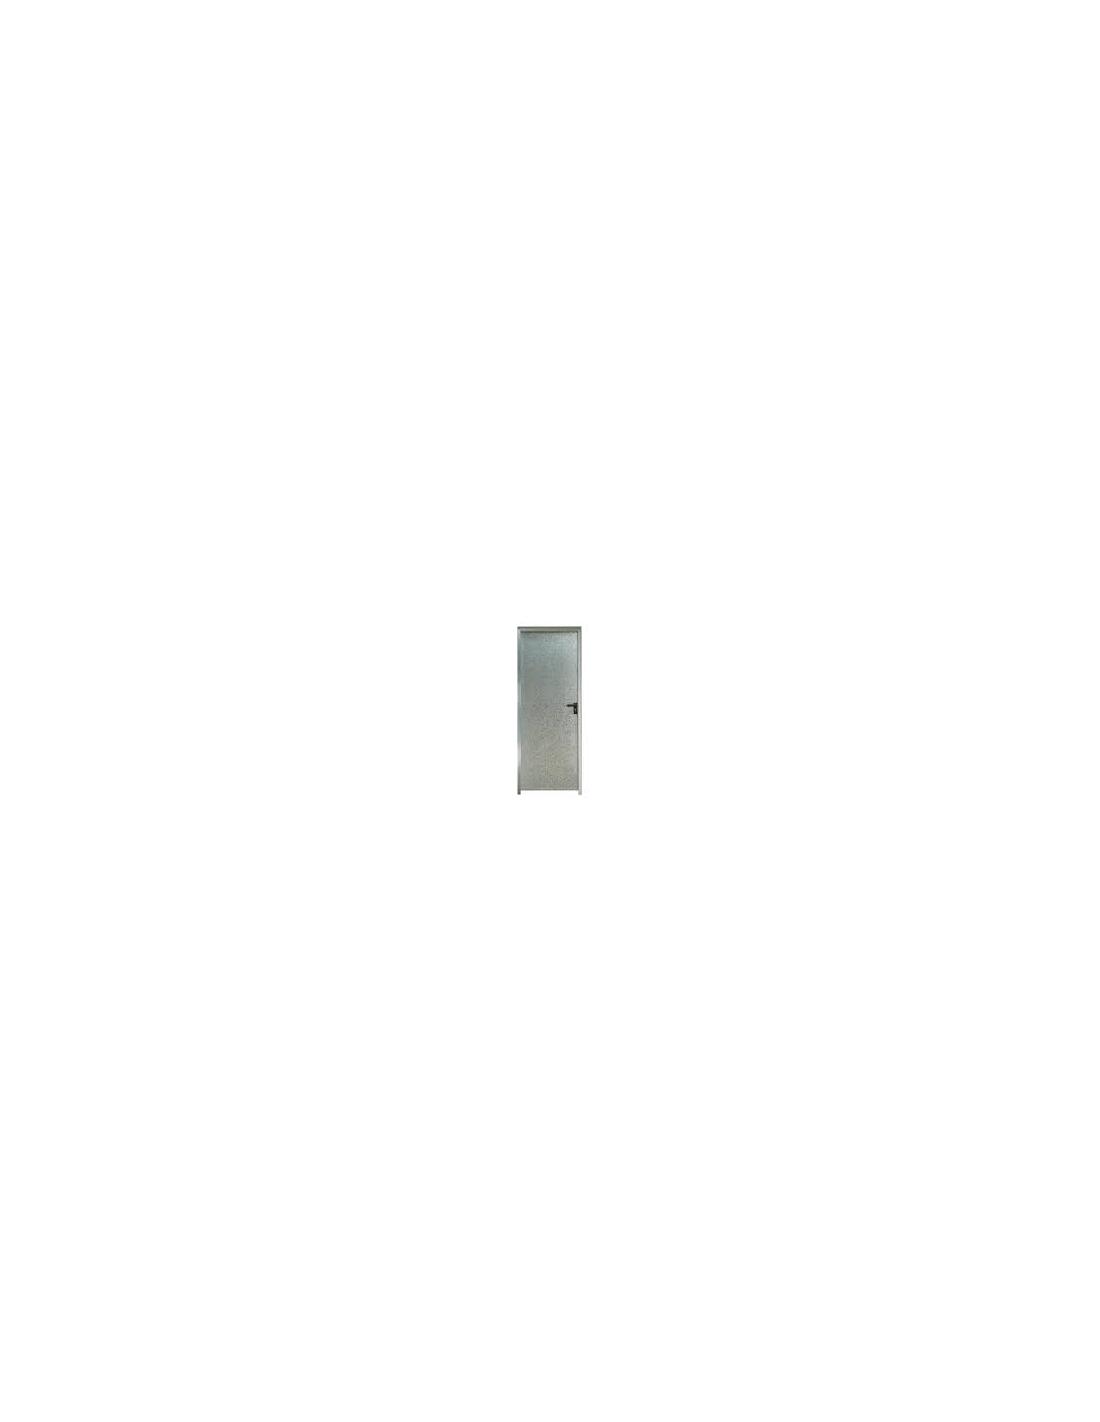 Puerta chapa galvanizada 80 x 2 m marco de 90 mm ciega - Puerta chapa galvanizada ...